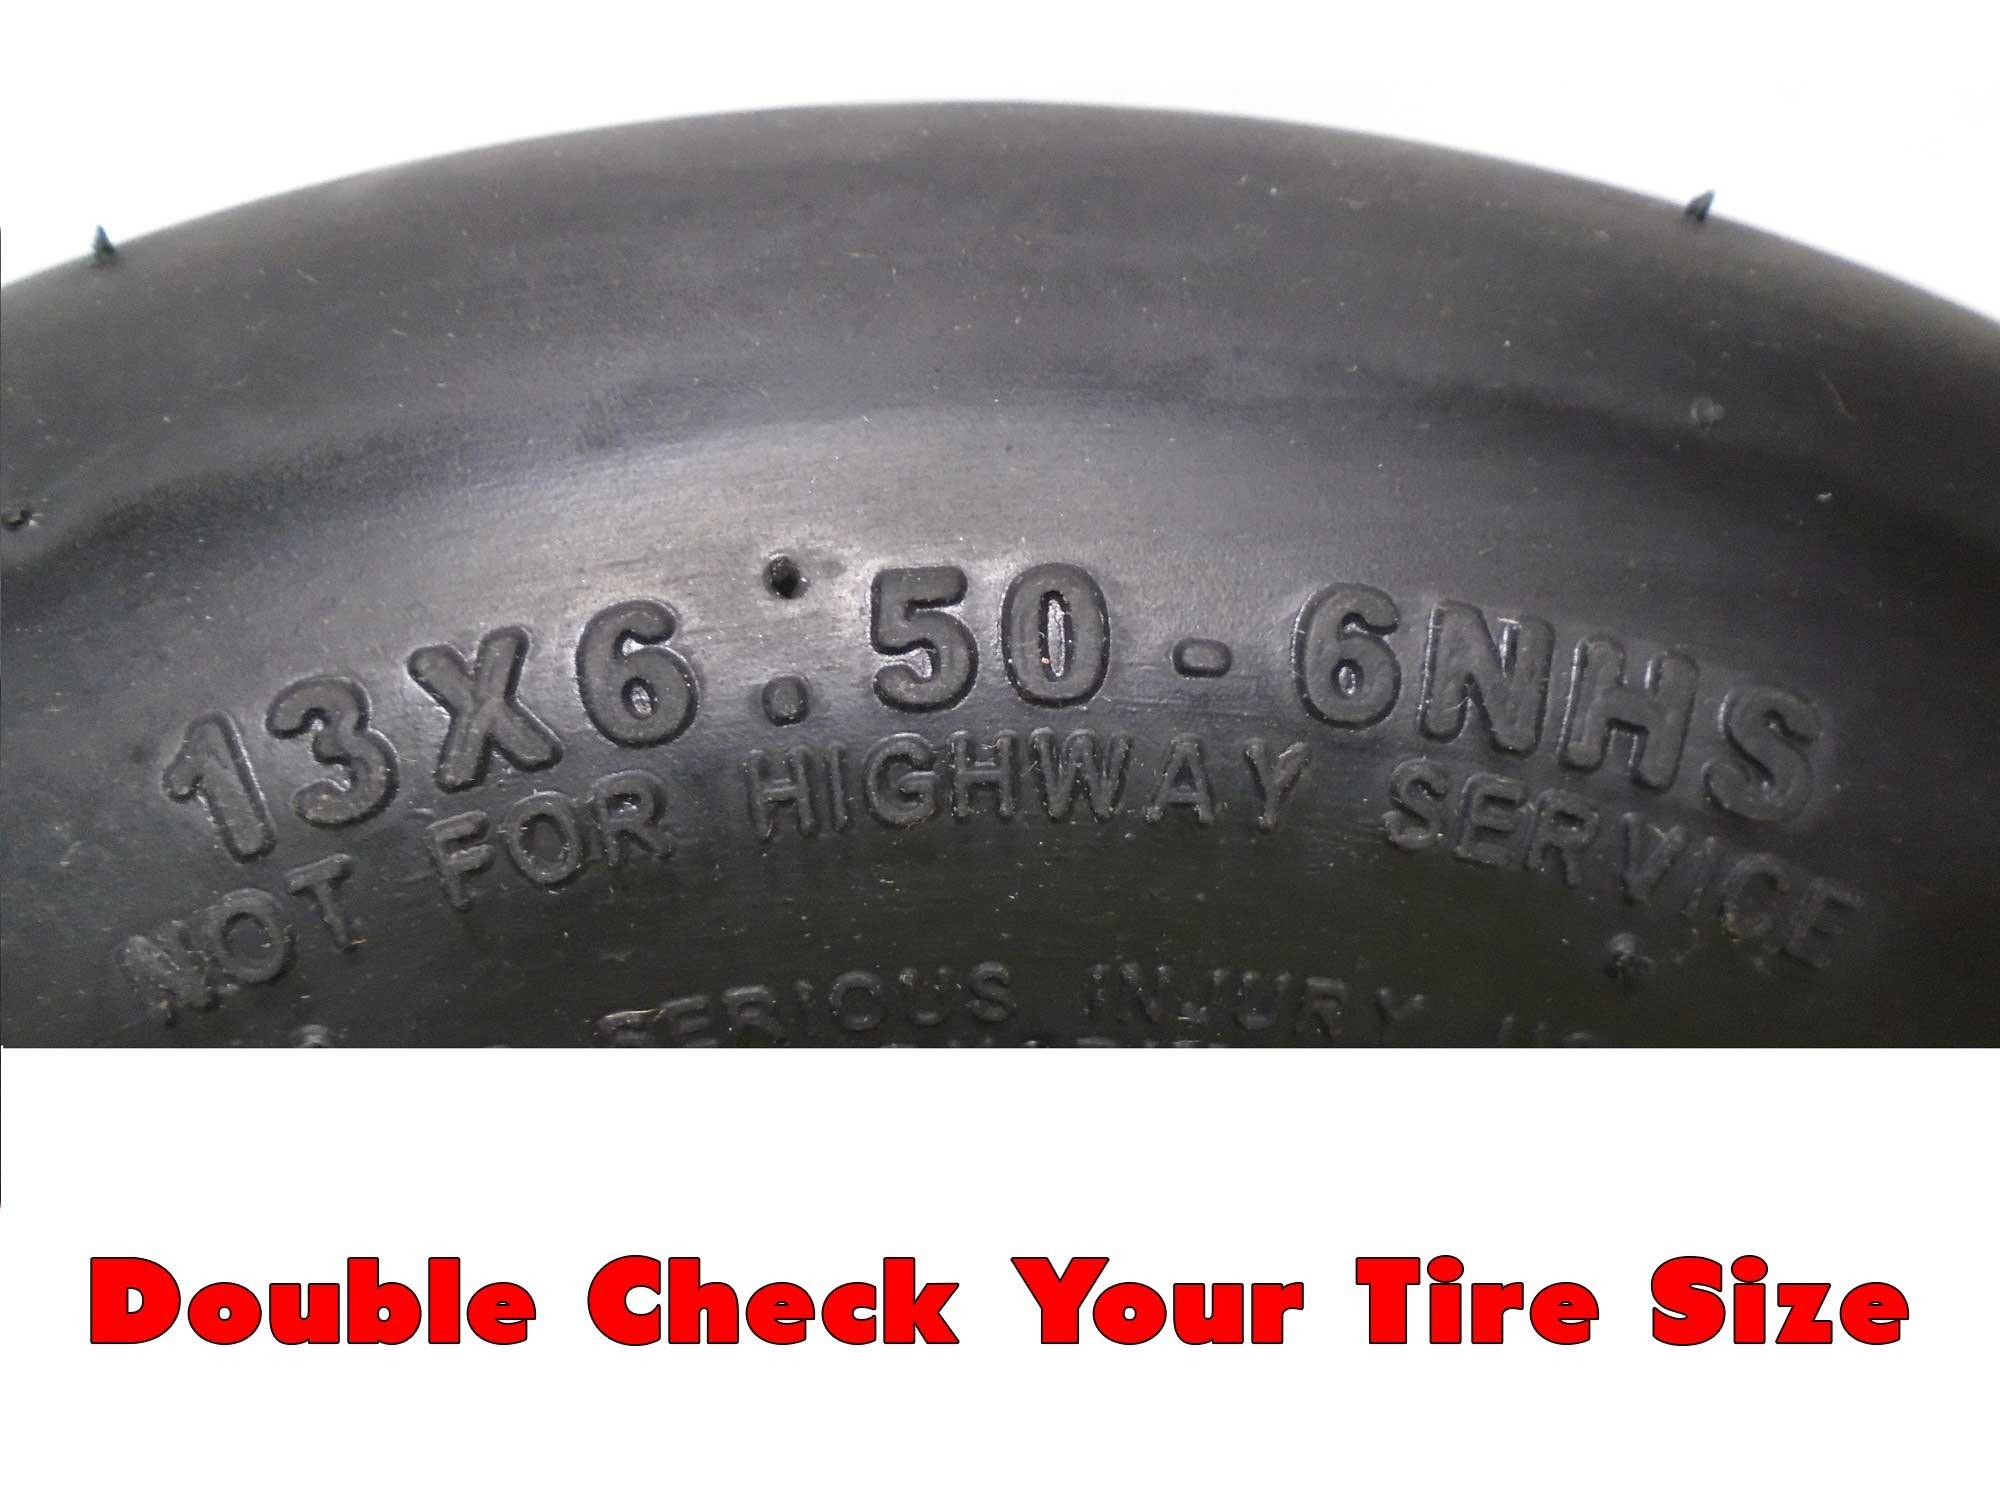 John Deere Flat Free Tire Assemblies 13x6.50-6 Yellow TCA19309 TCA16946 by NoAir (Image #2)